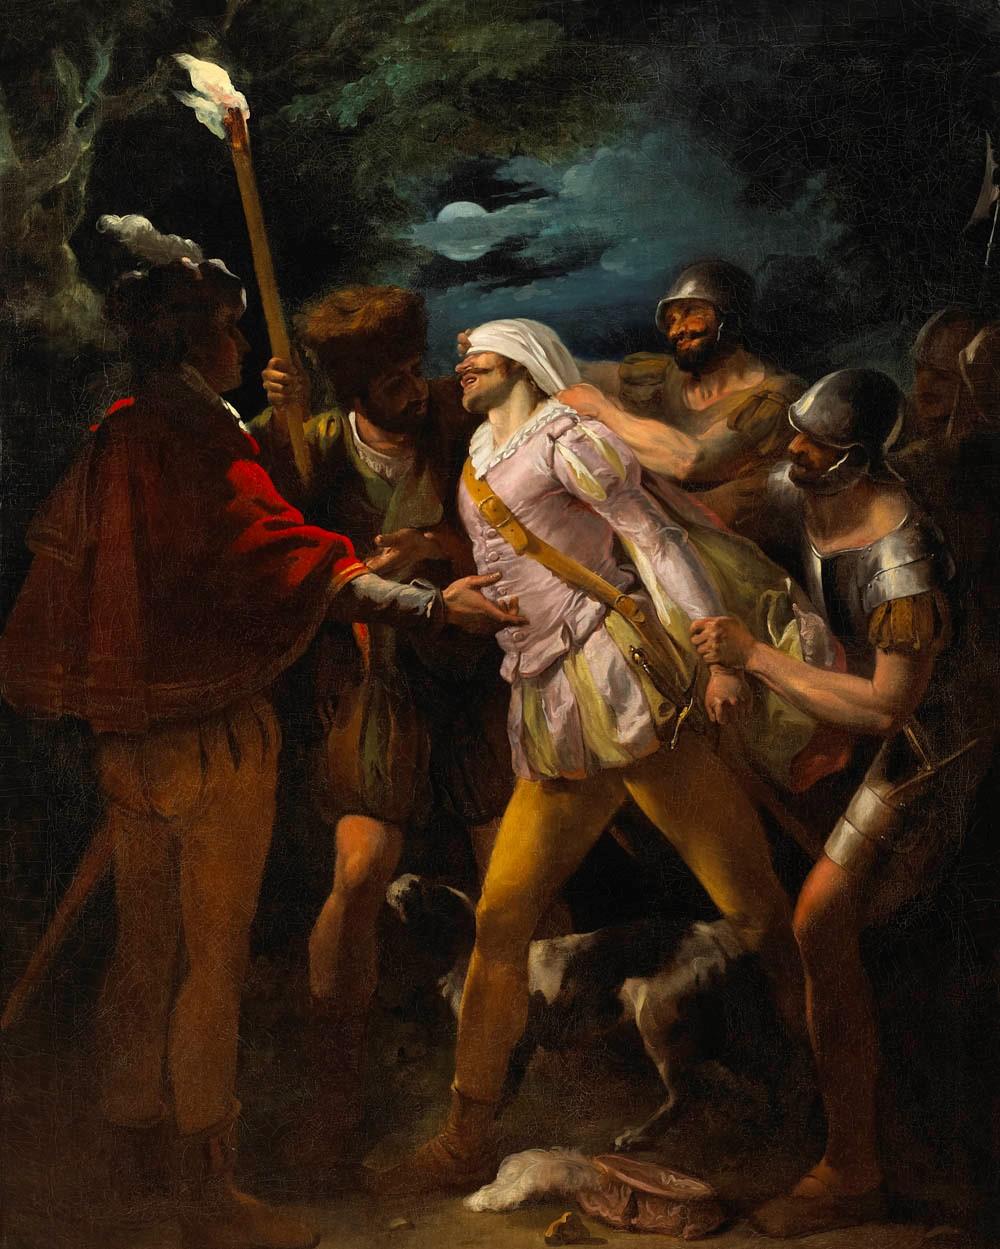 Francis Wheatley Parolles Ambushed and blindfolded - Fota House